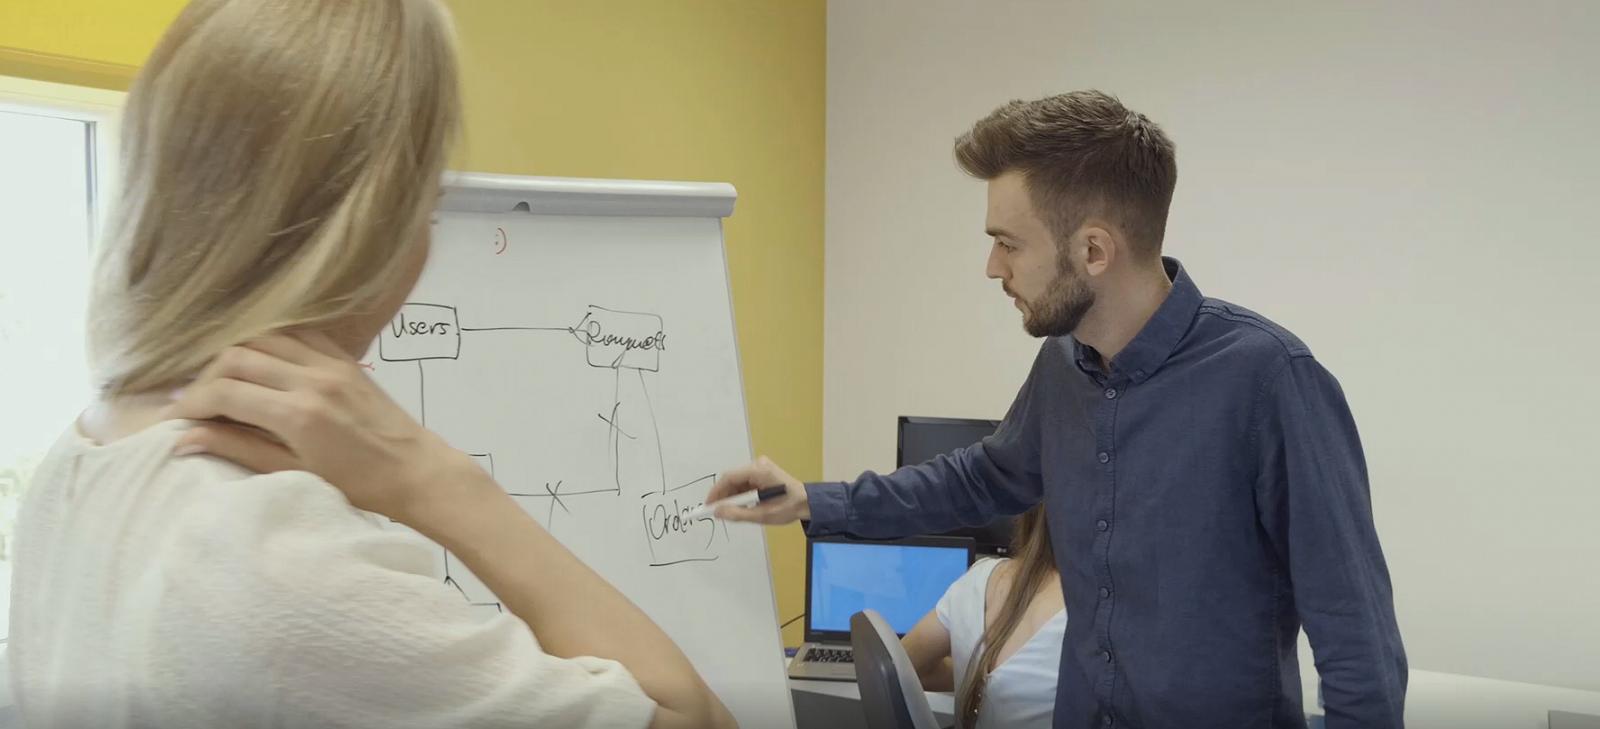 Teamarbeid - Ideo Solutions AS